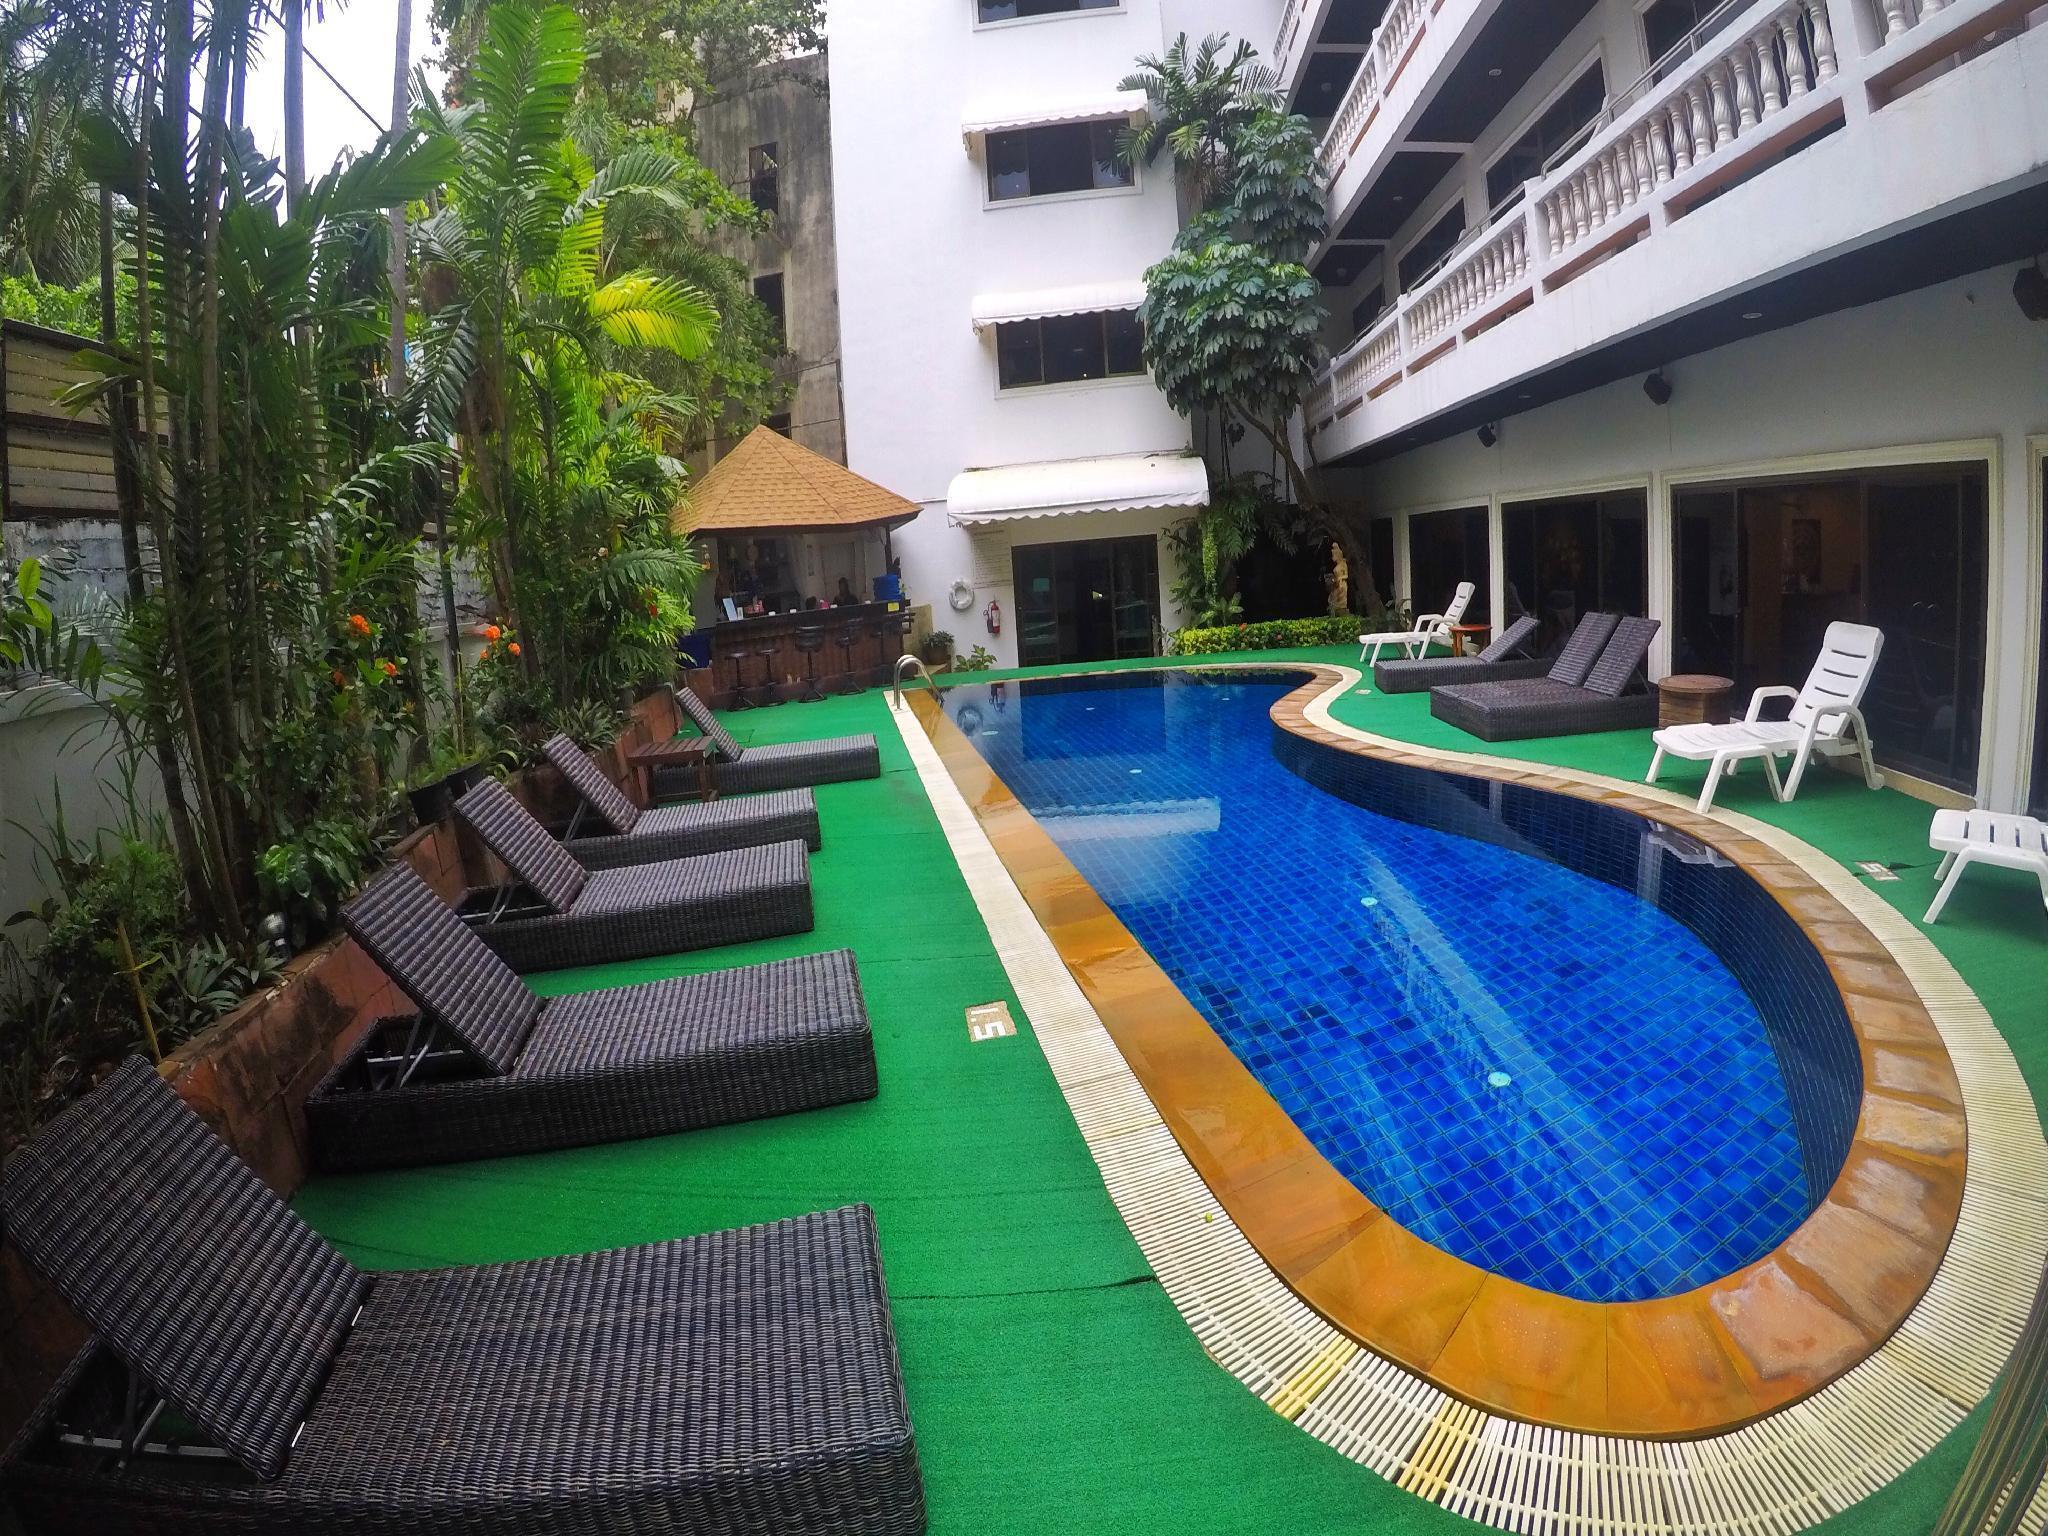 Open 3 bedroom apartment center of Patong Beach #c อพาร์ตเมนต์ 3 ห้องนอน 4 ห้องน้ำส่วนตัว ขนาด 125 ตร.ม. – ป่าตอง